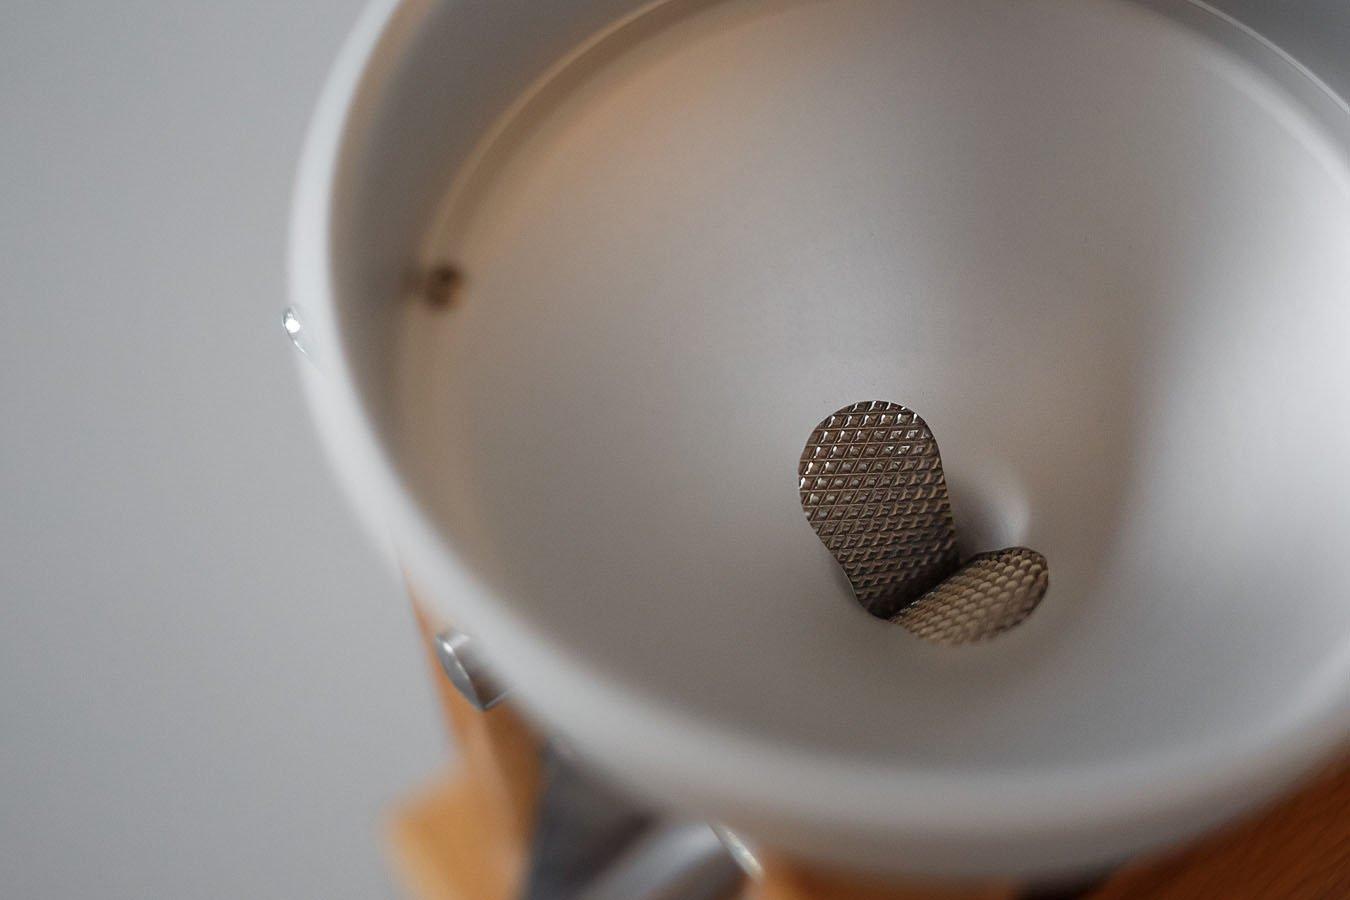 Eschenfelder Grain Flaker with Anodized Aluminum Funnel by Happy Mills